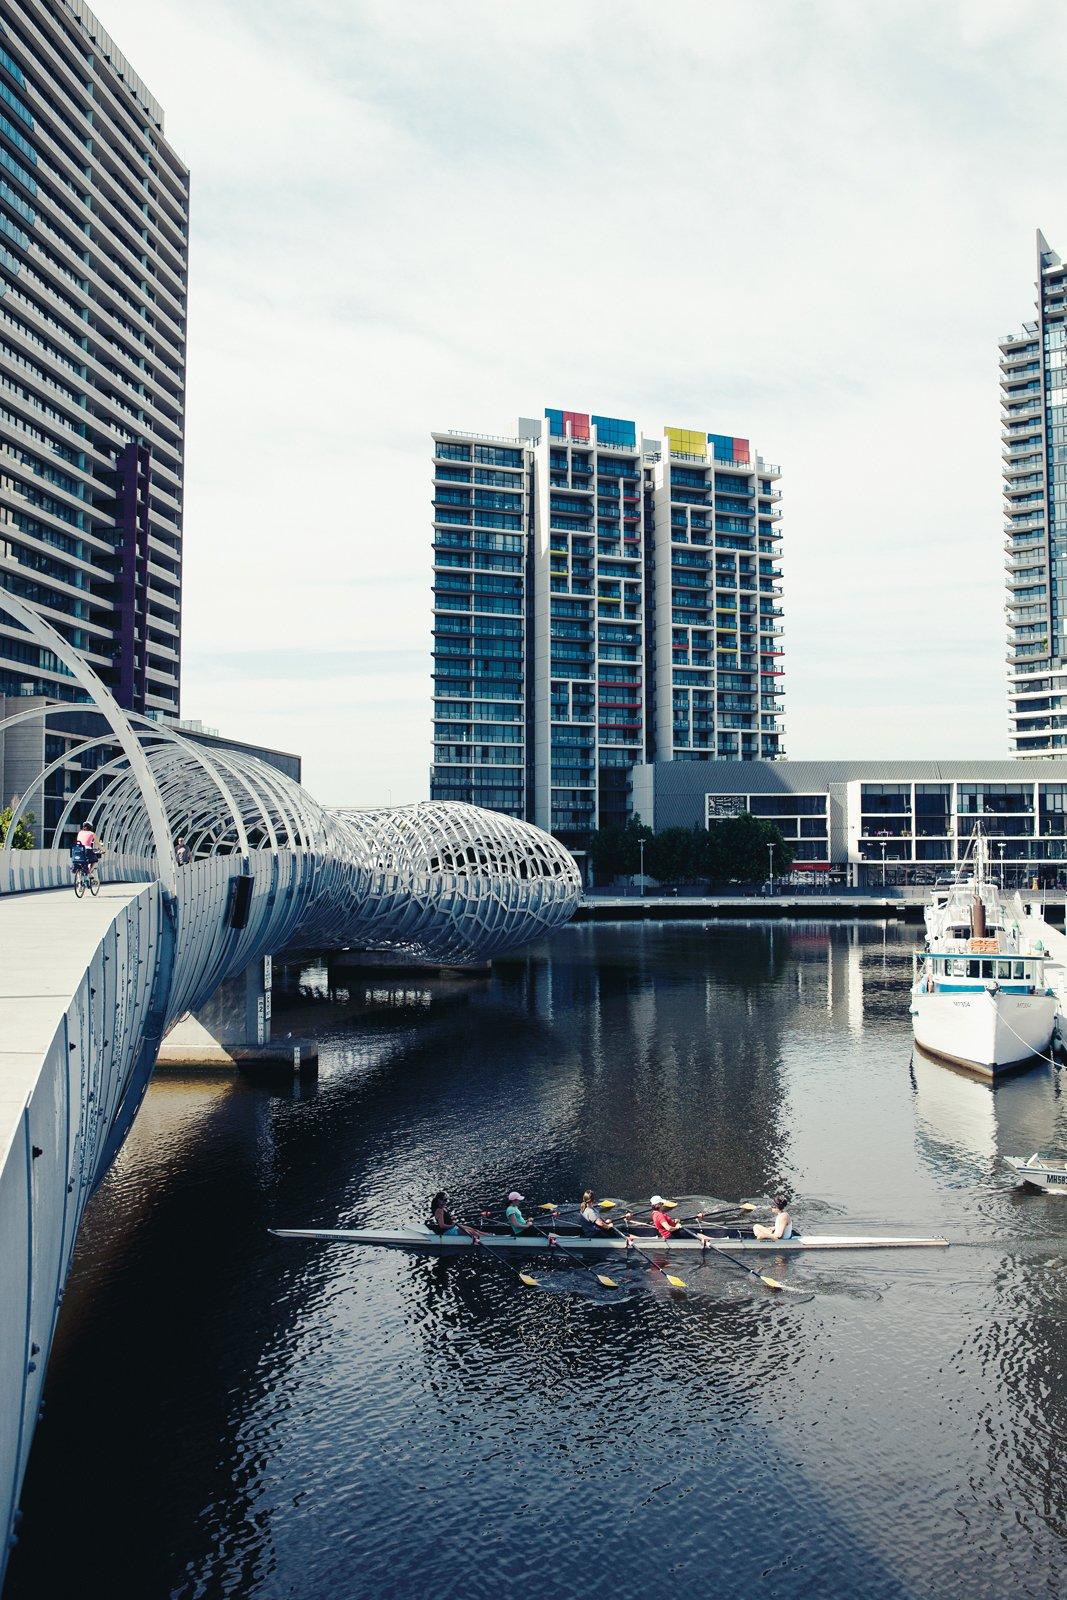 Web Bridge, The Docklands  Photo 14 of 24 in Exploring Melbourne, Australia